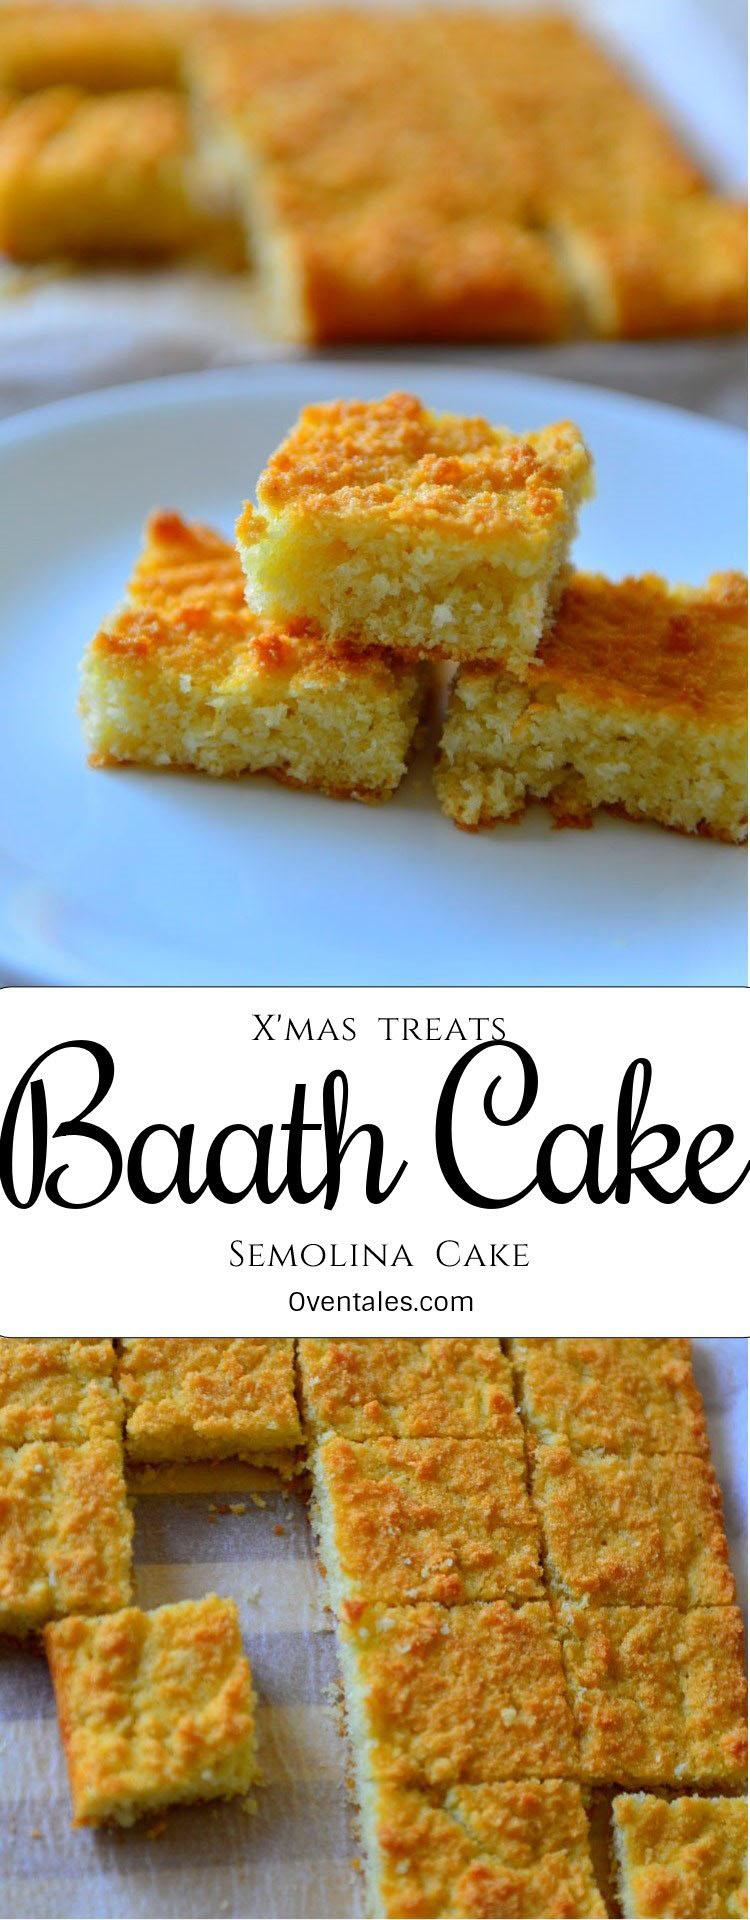 Baath Cake